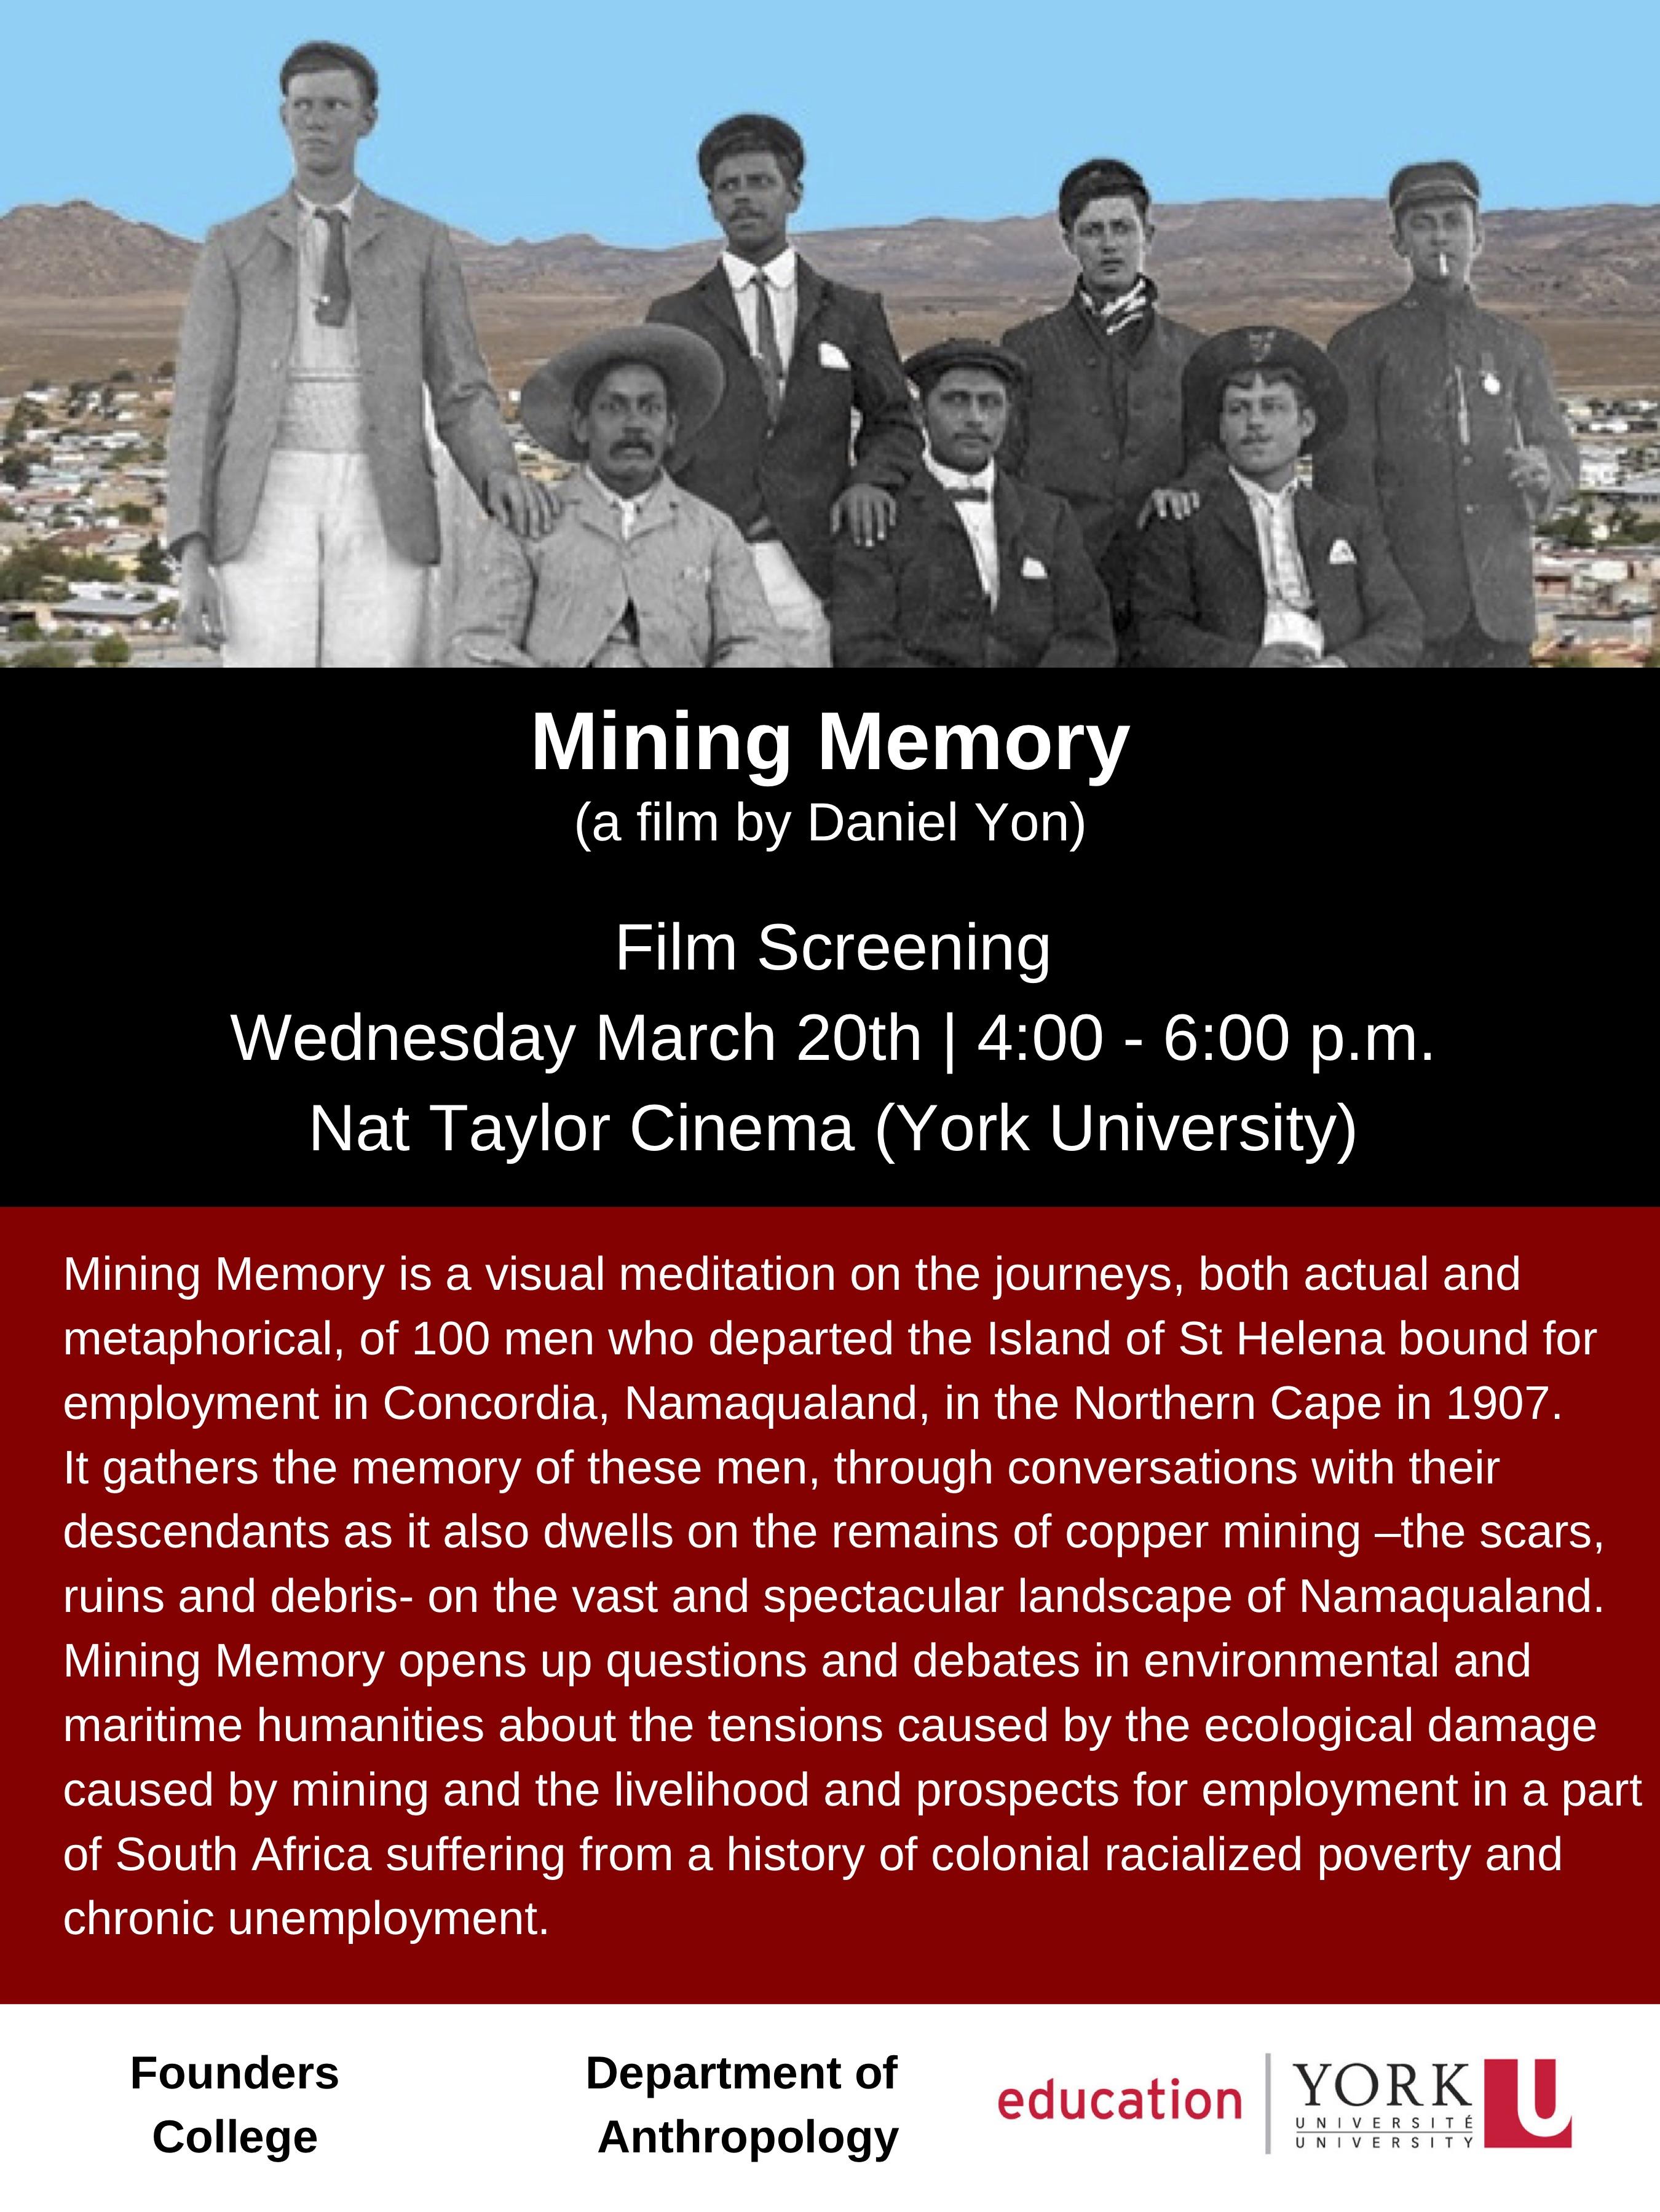 Mining Memory film screening poster